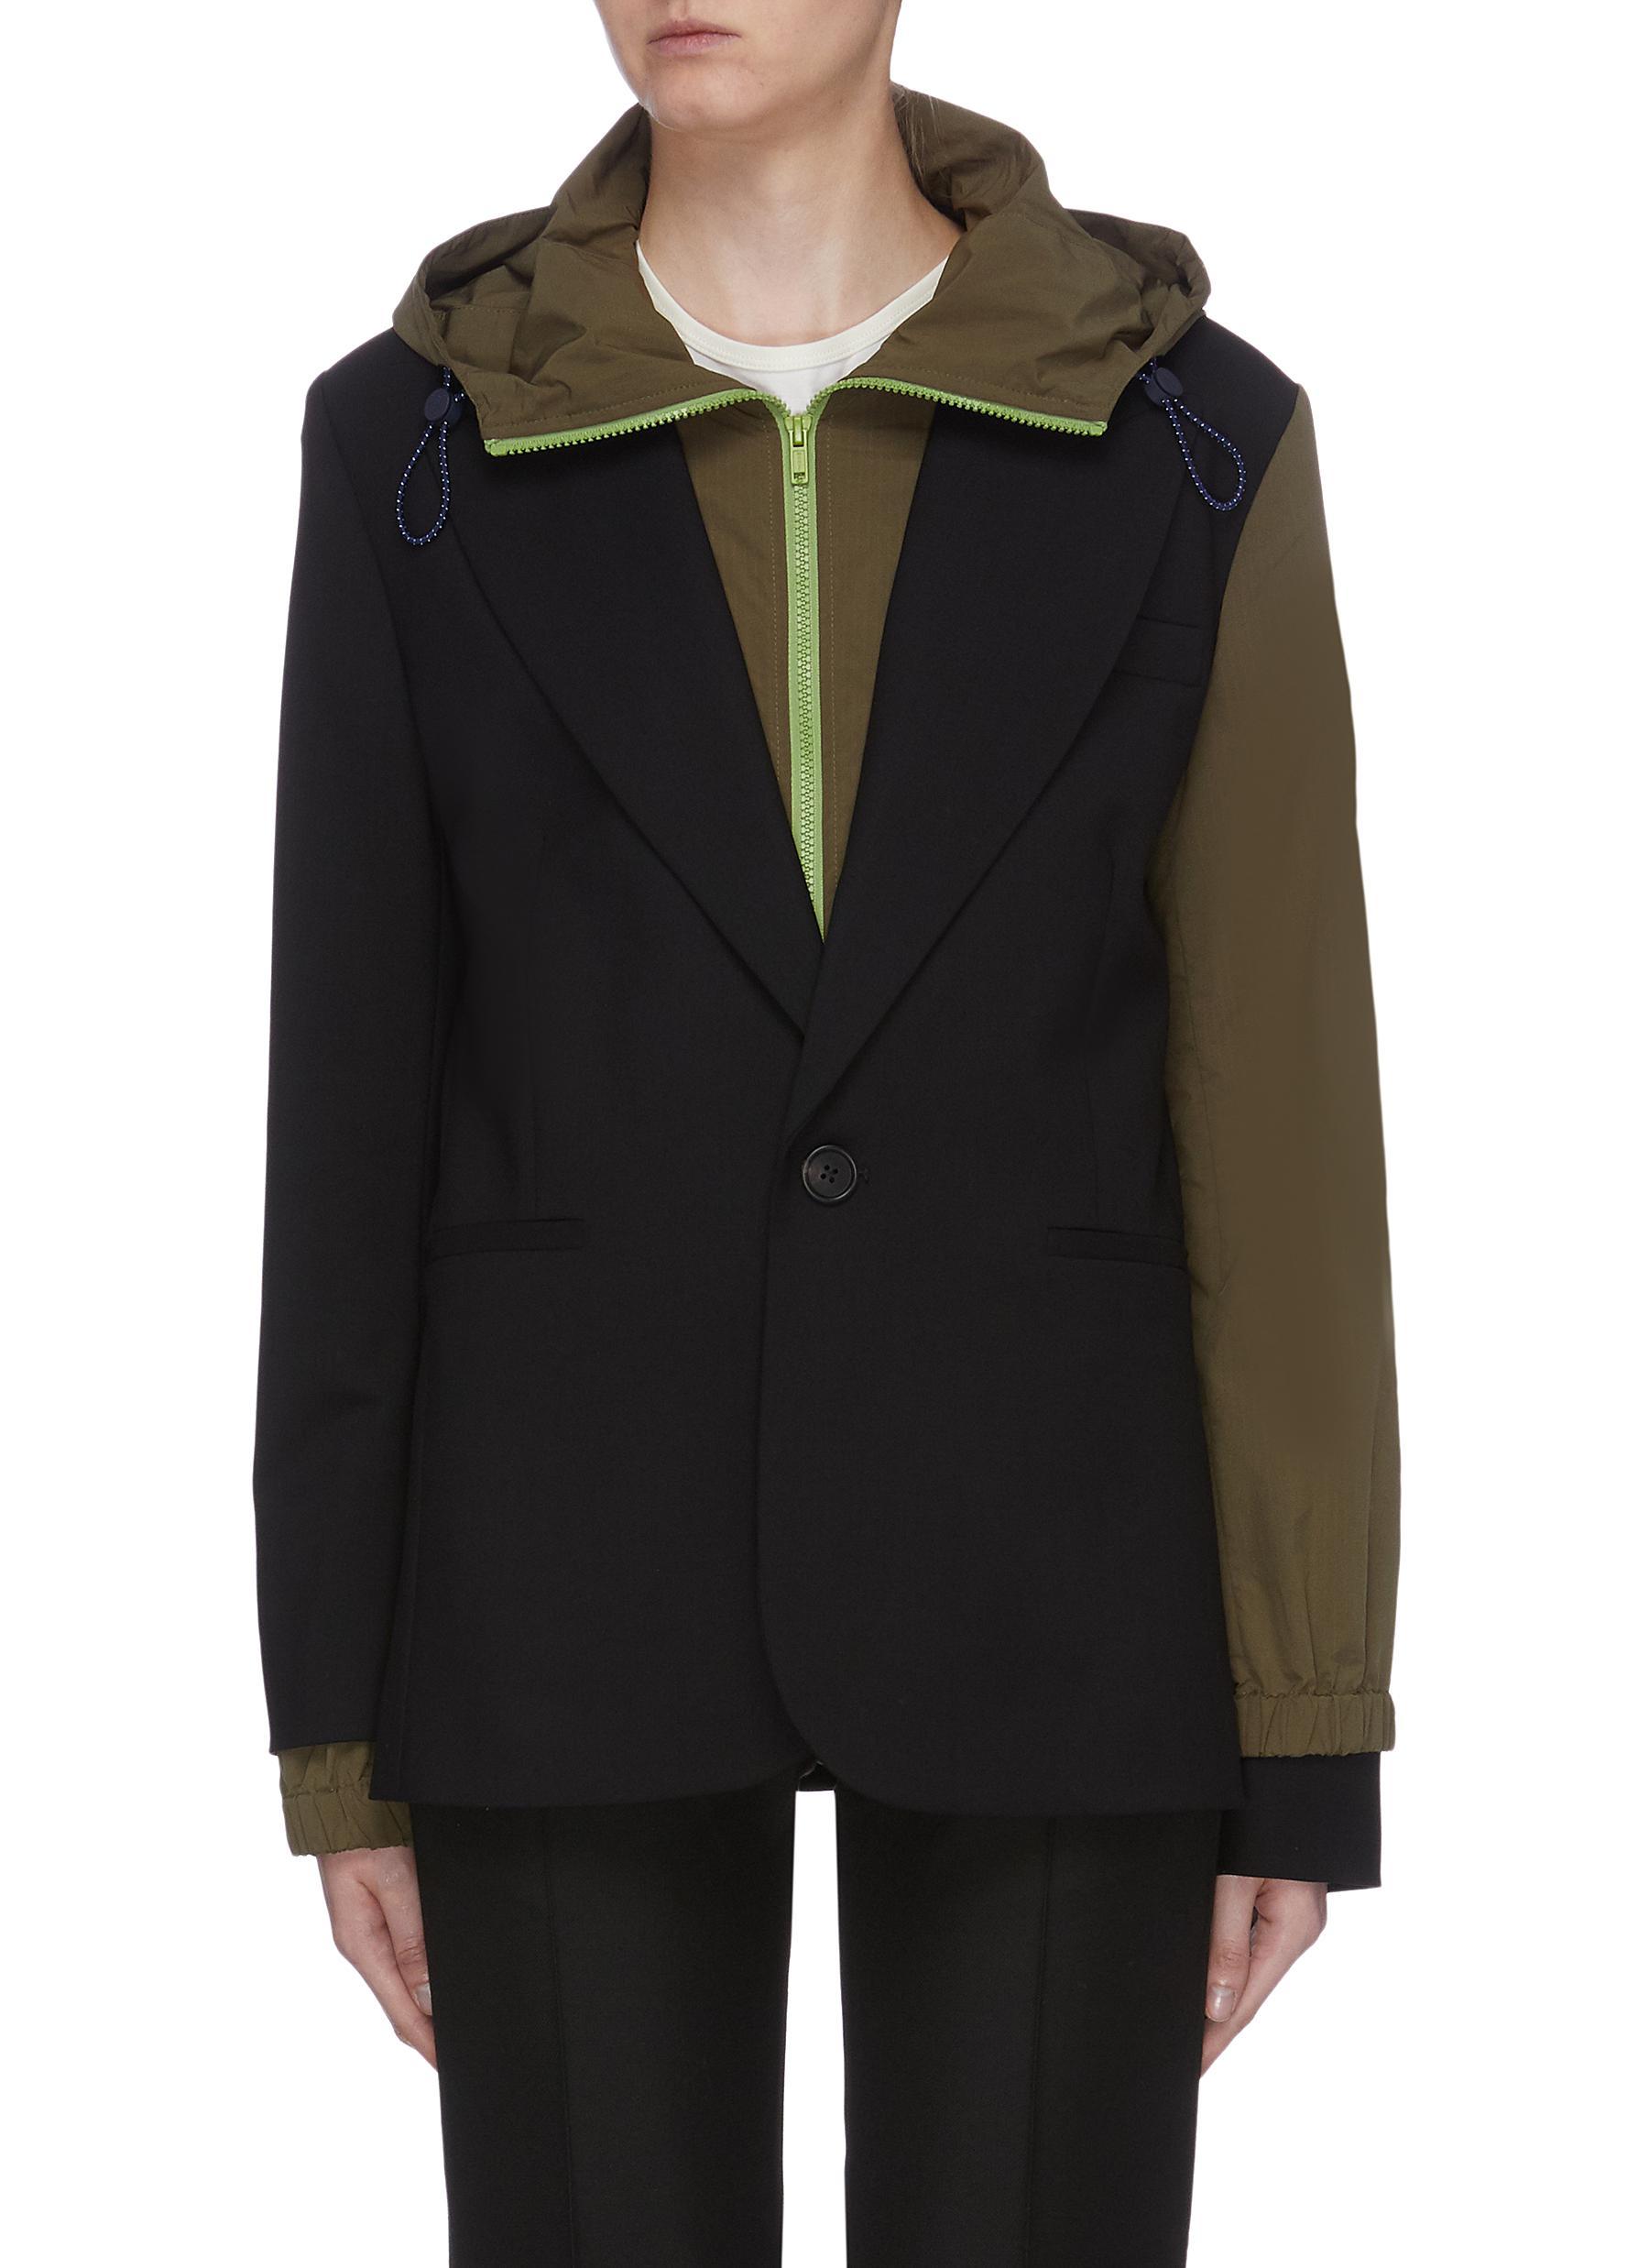 Hooded jacket underlay Virgin wool blazer by Monse